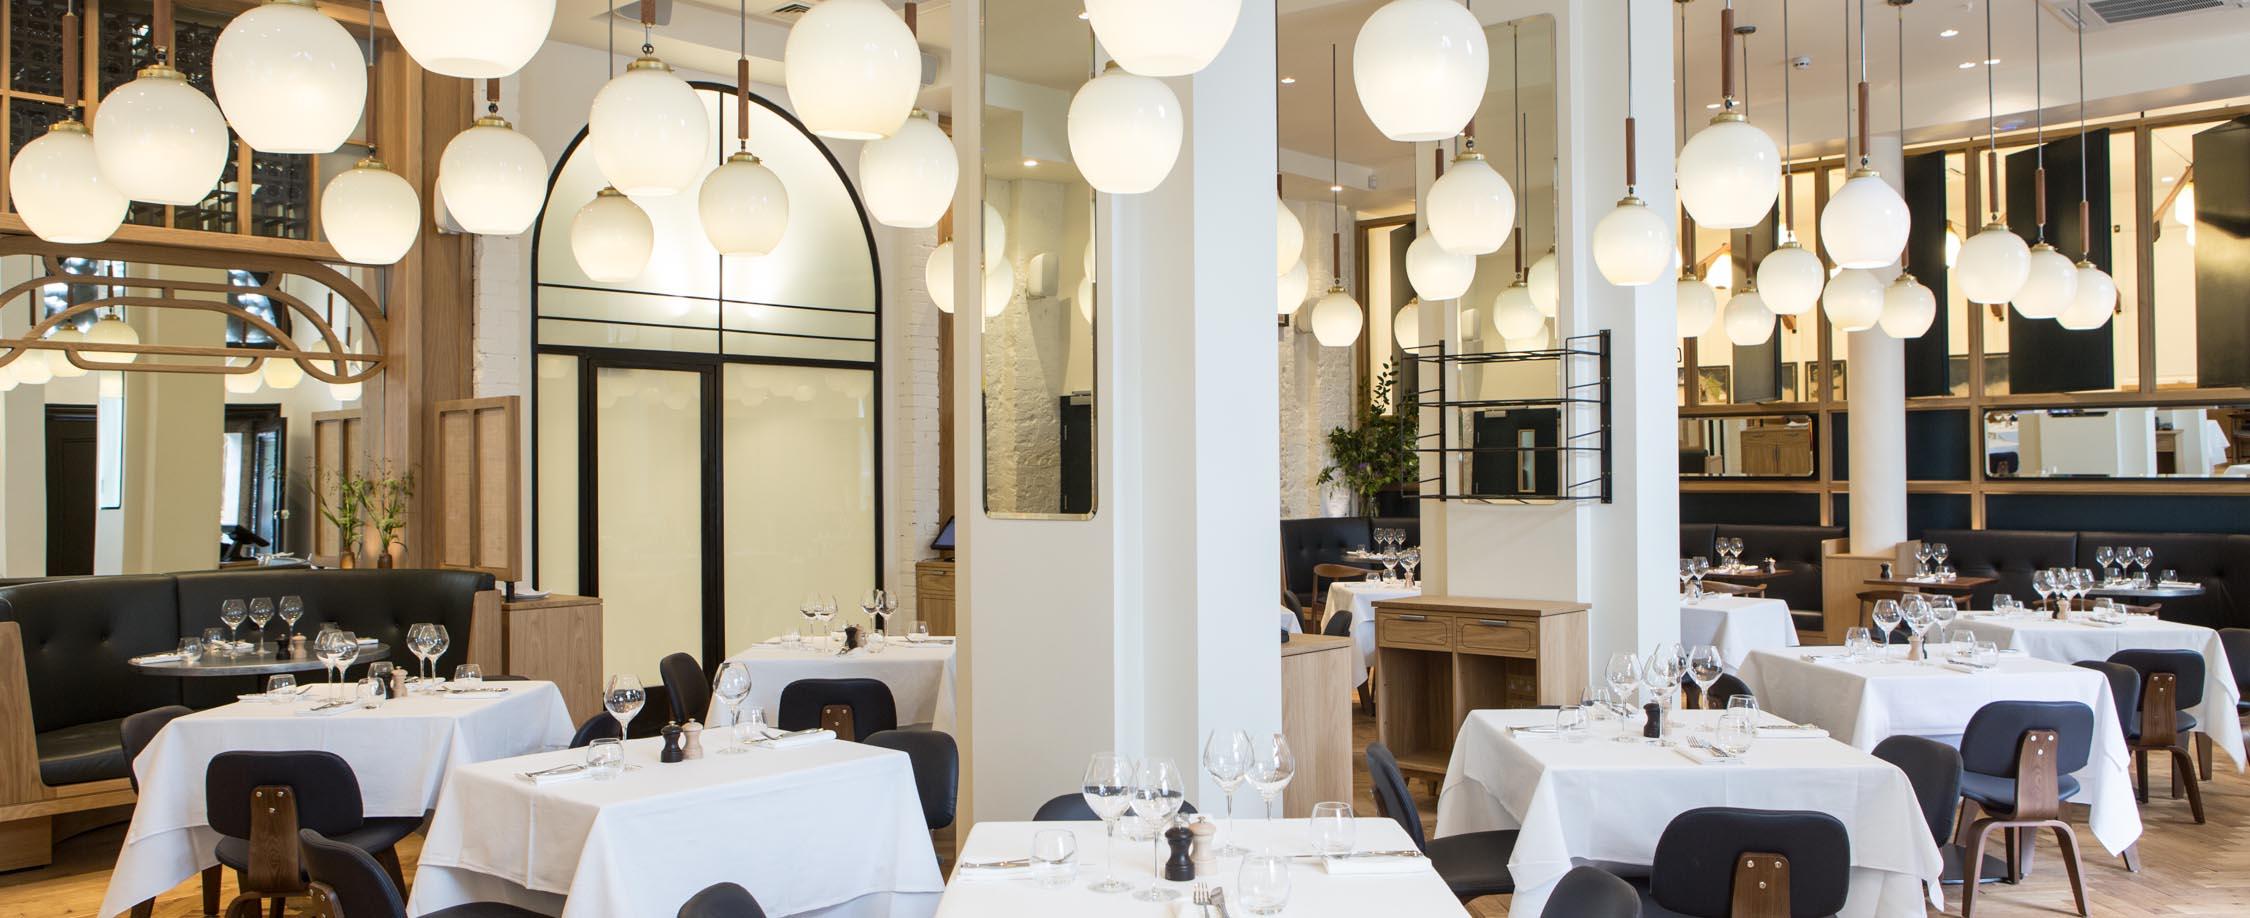 Restaurants - olive magazine - 28